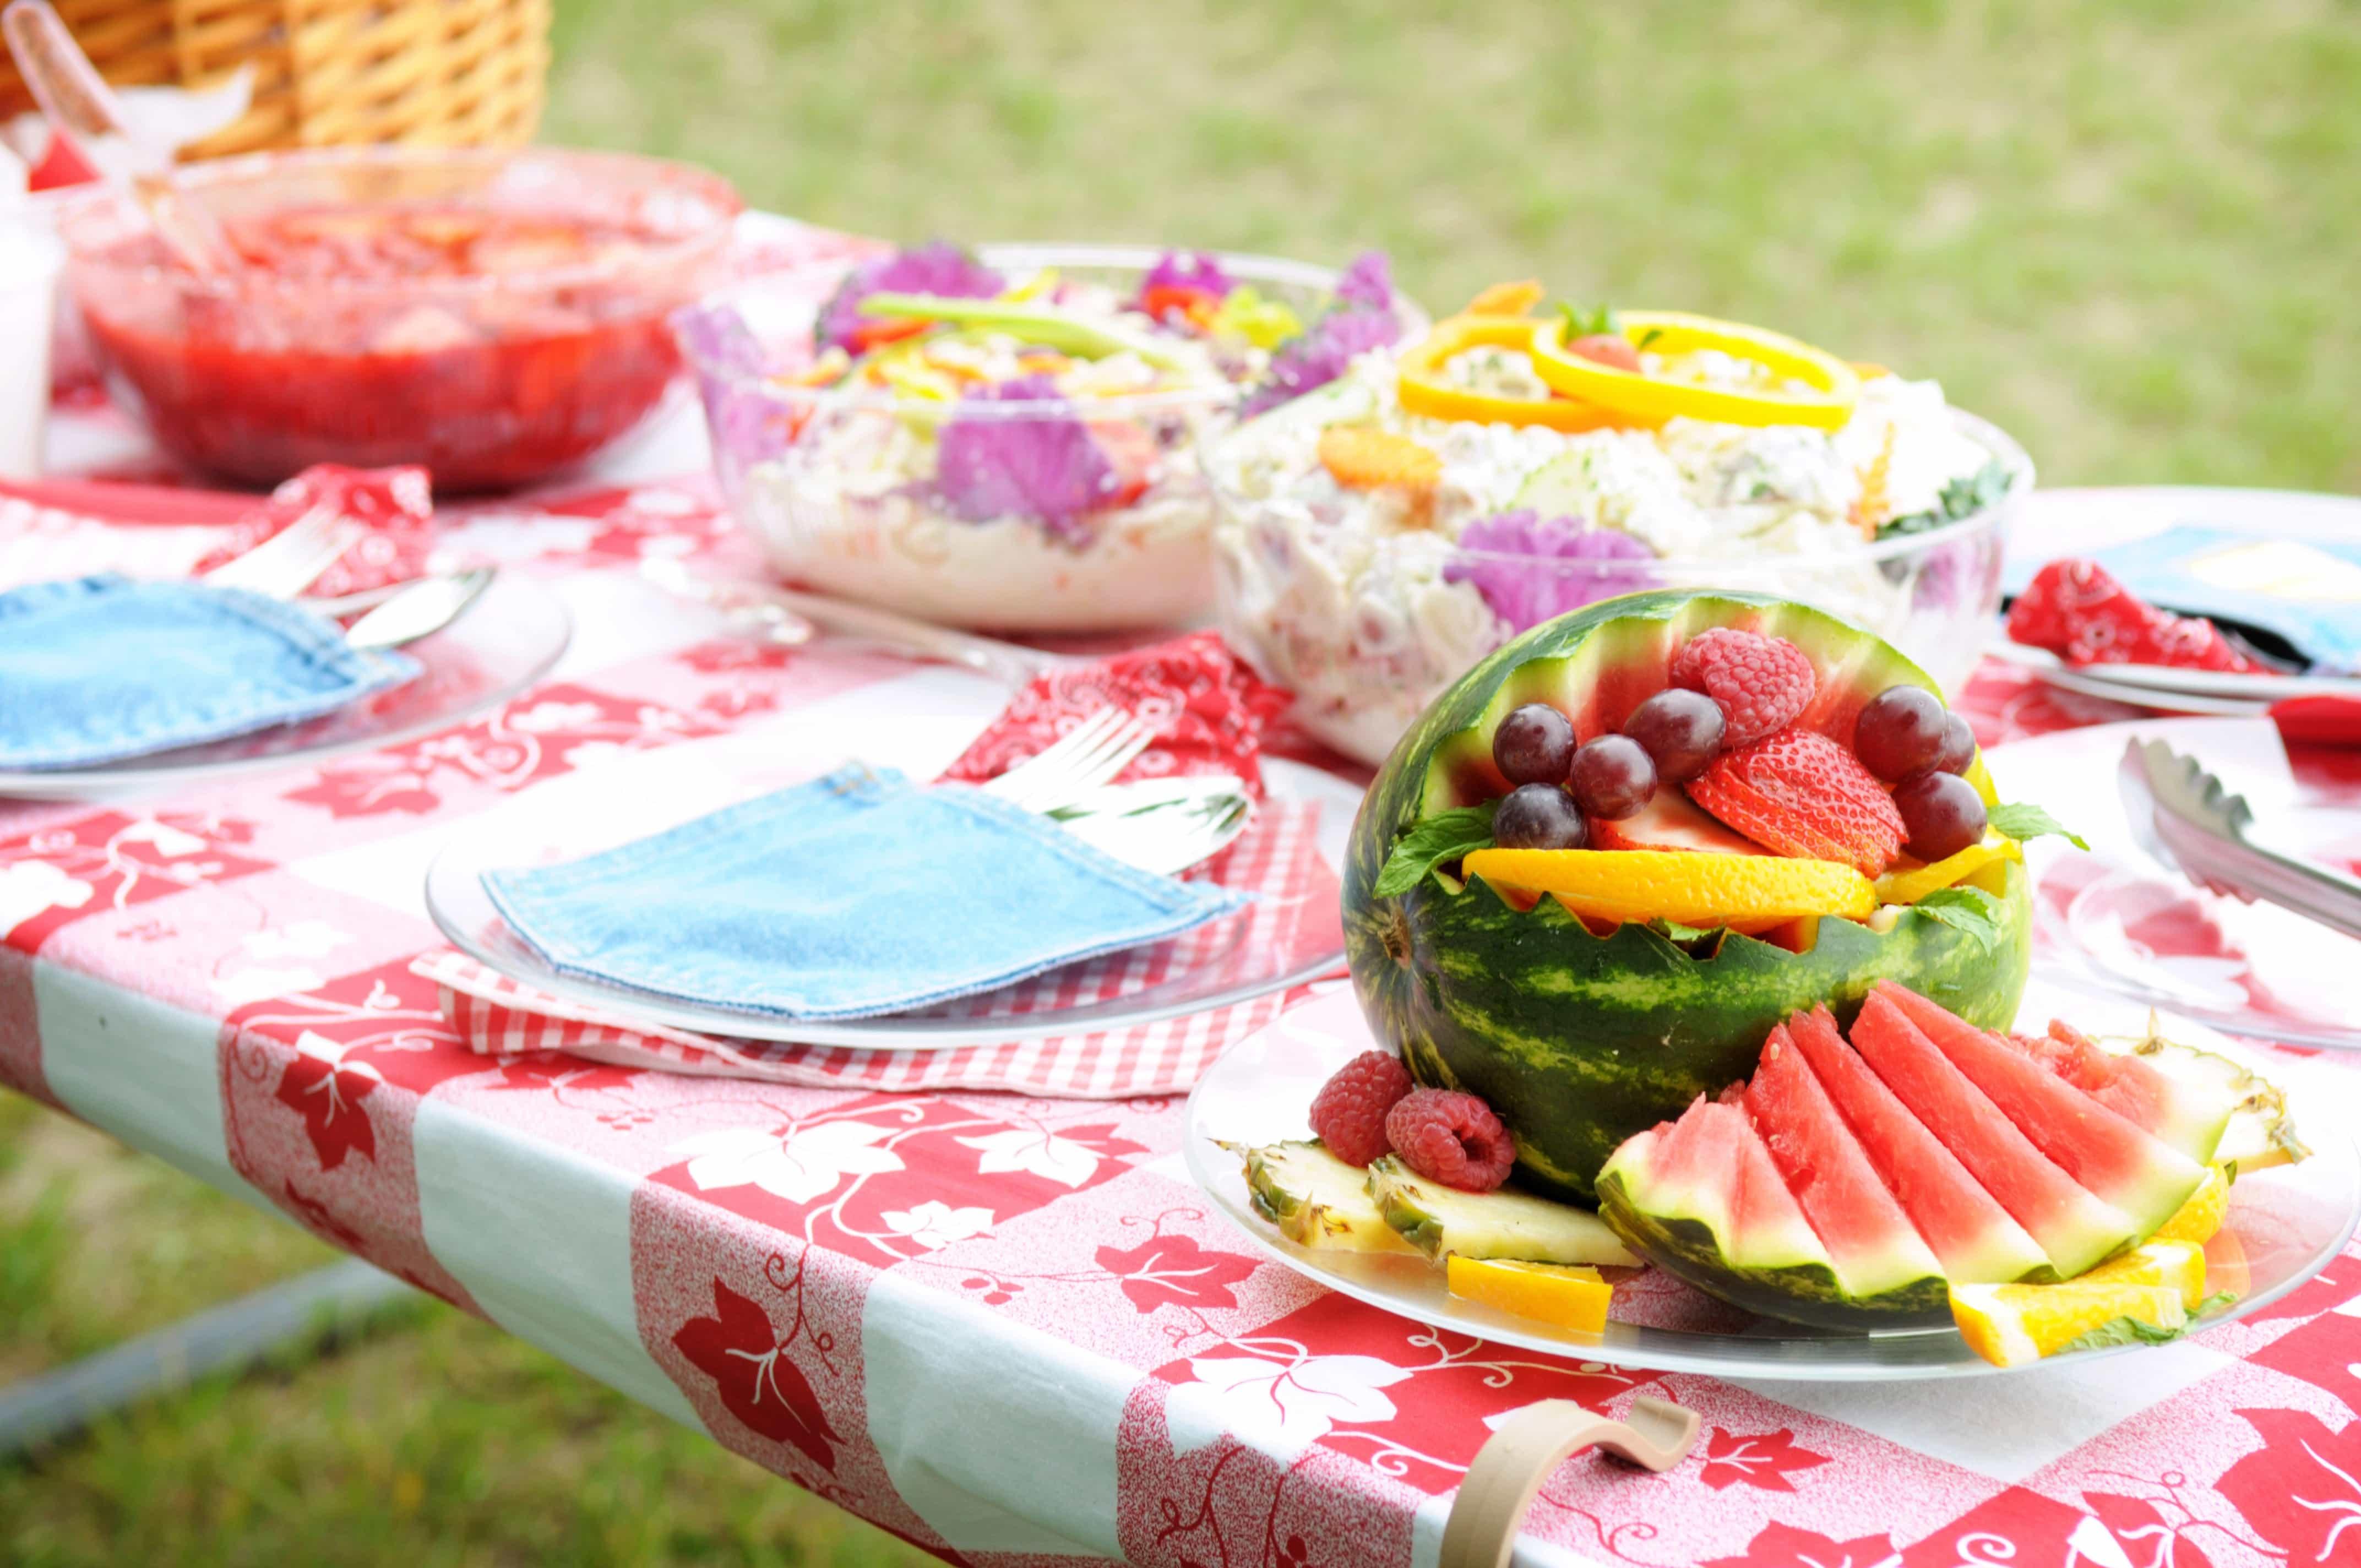 picnic_table_food